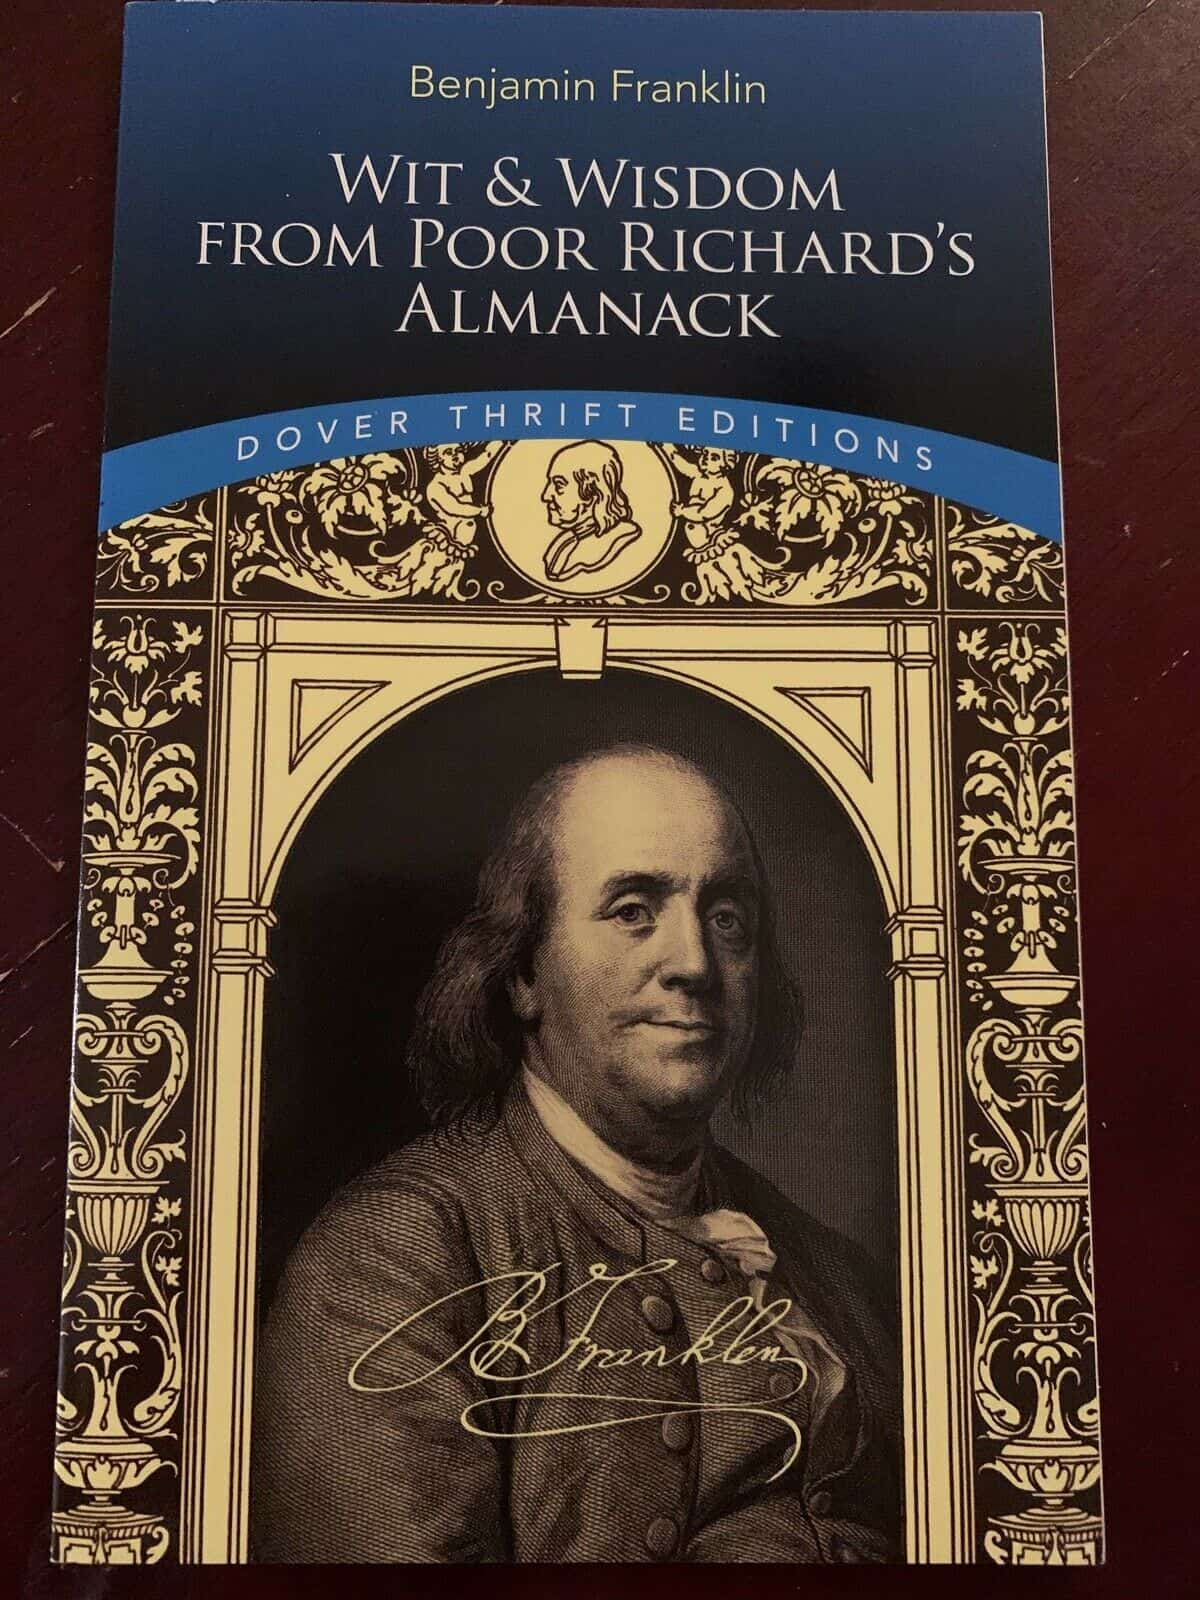 Benjamin Franklin Wit & Wisdom